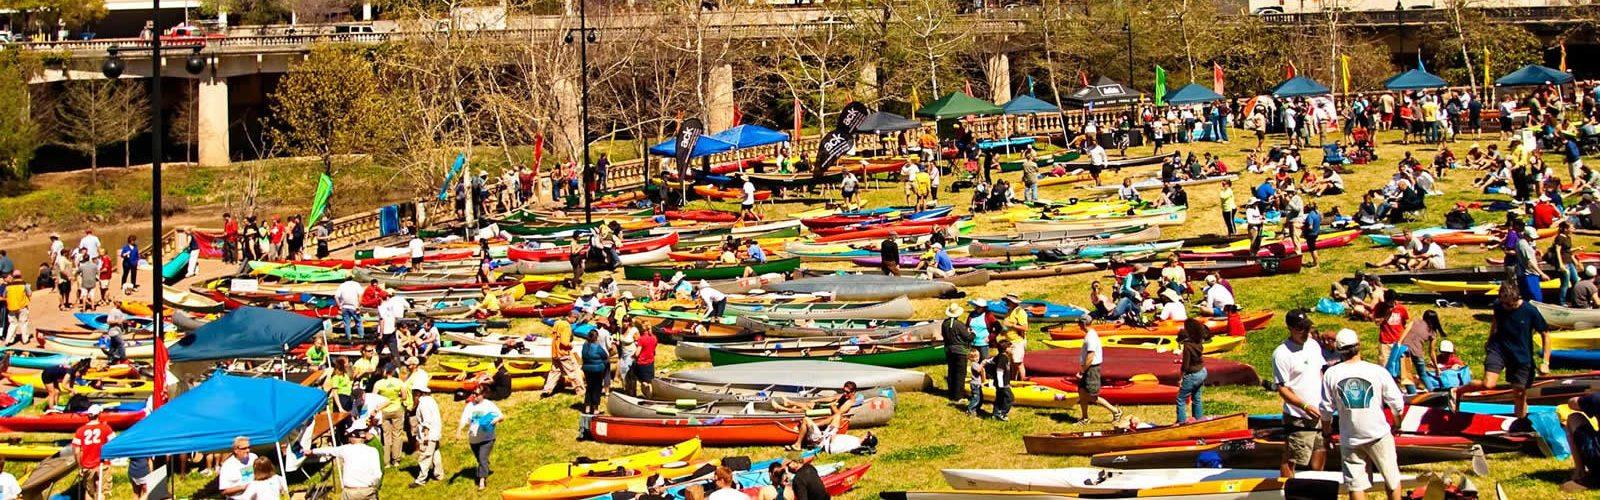 canoe-kayak-buffalo-bayou-houston-une